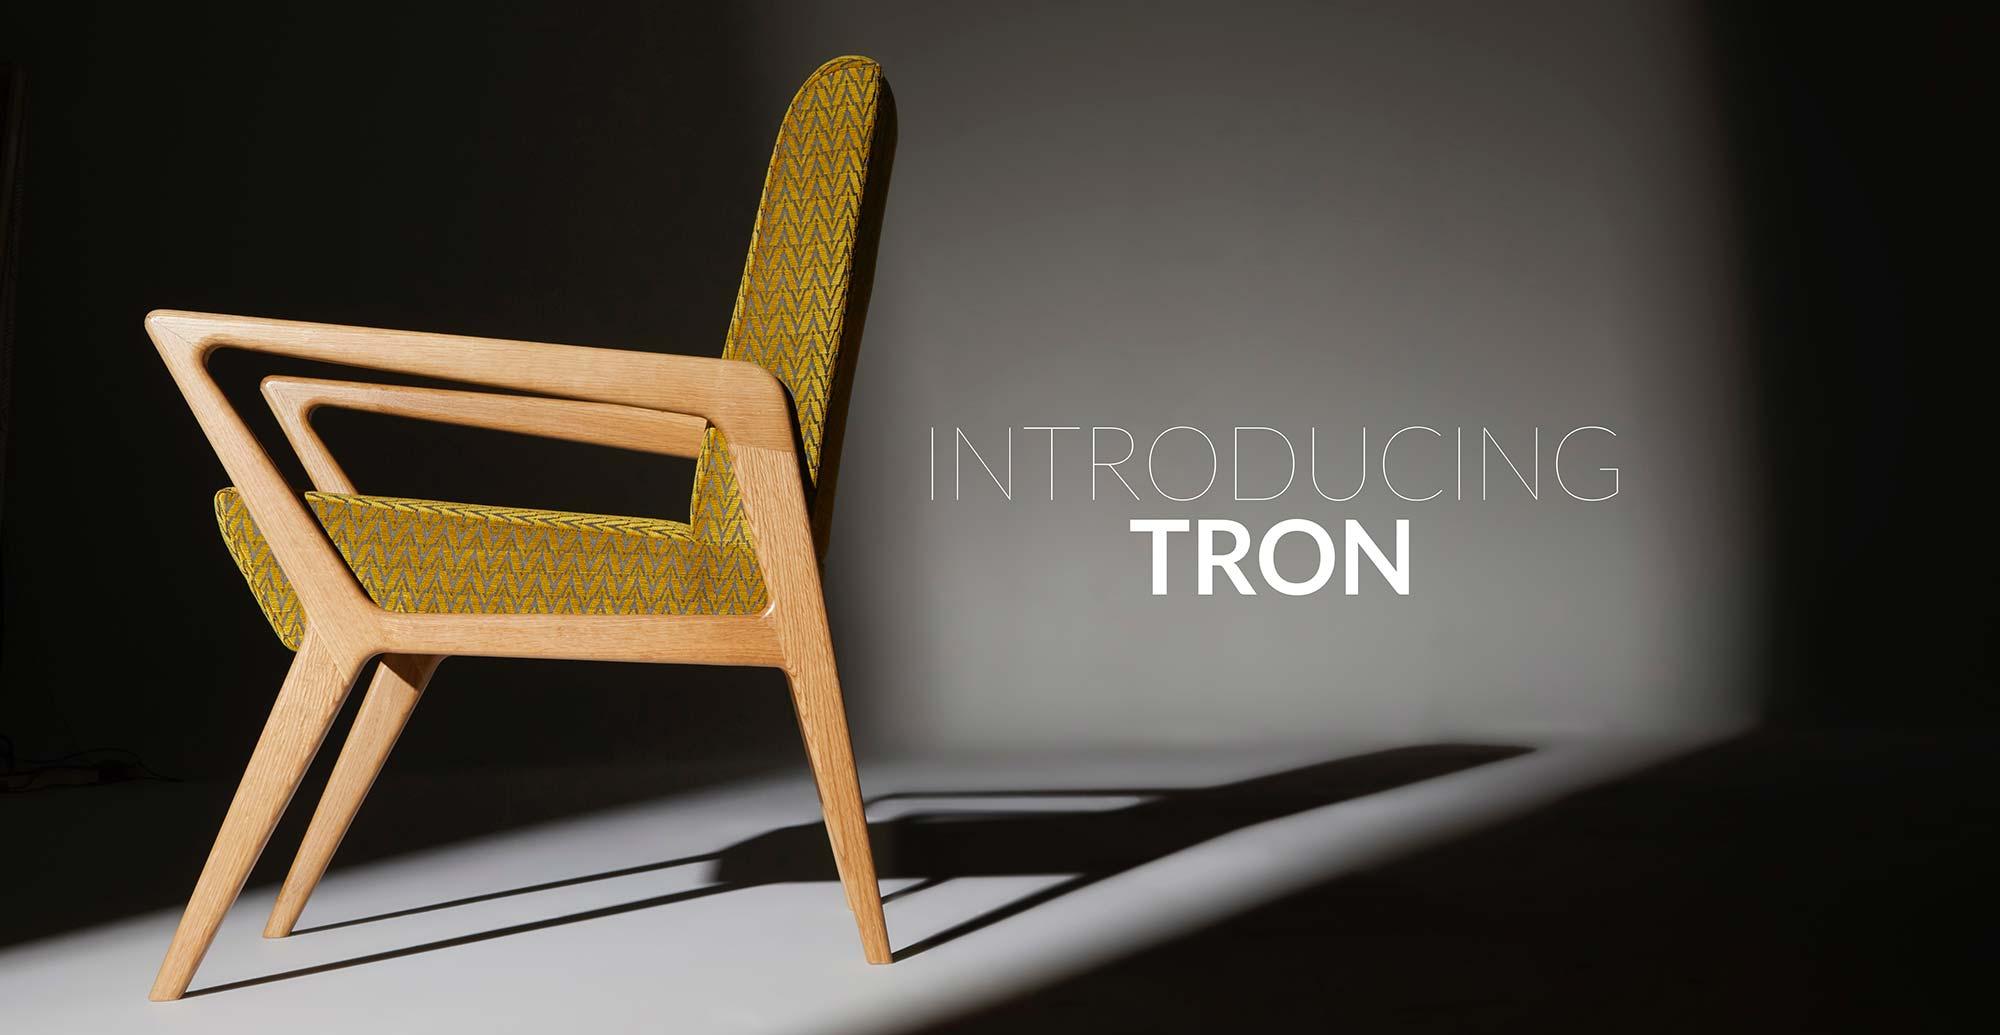 Introducing Tron